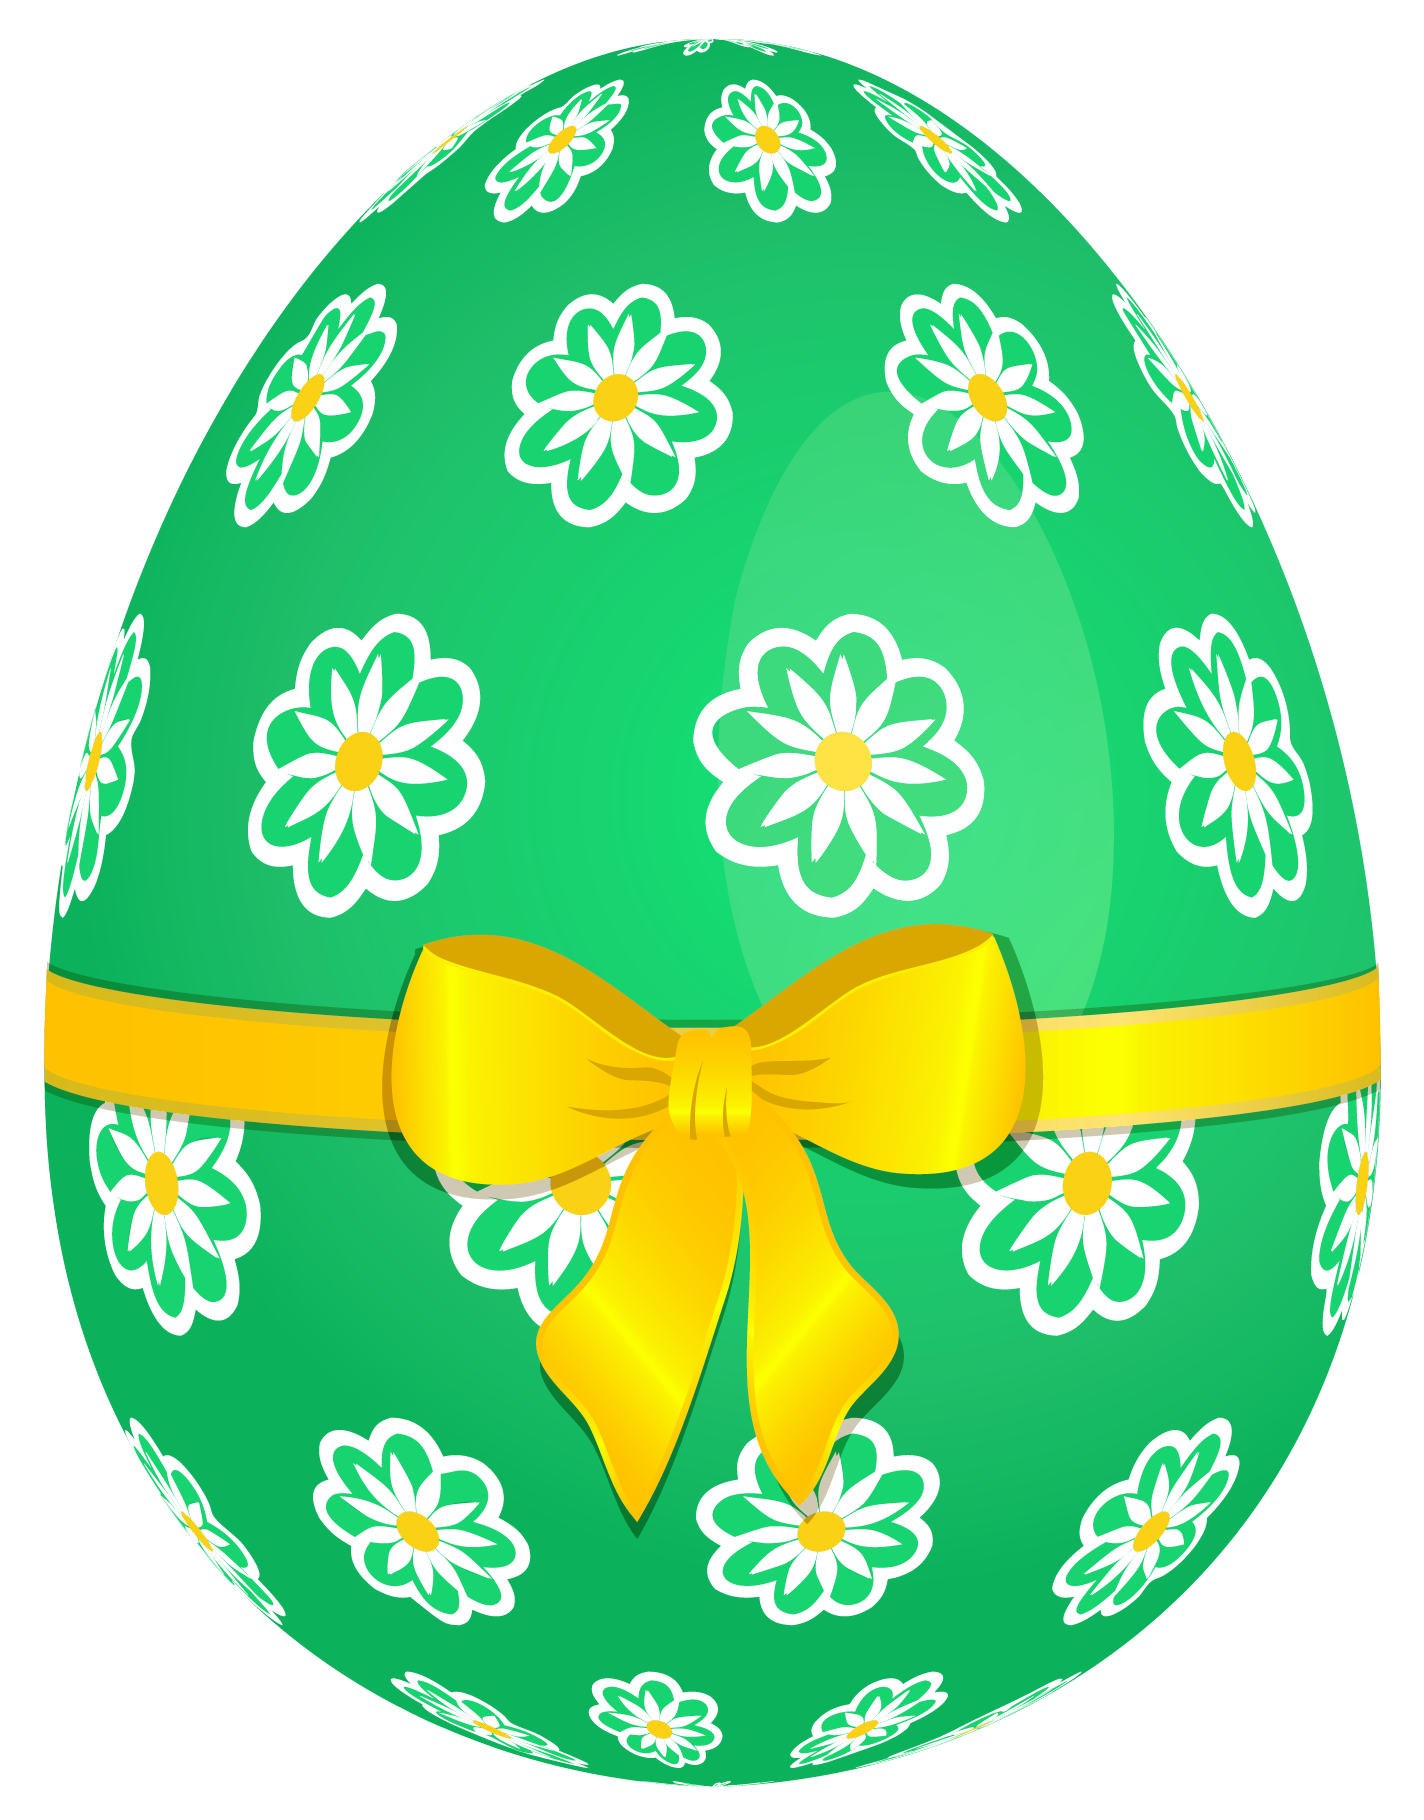 Easter egg images clip art picture free download EASTER EGG CLIP ART | Baby shower | Pinterest | Clip art, Easter and Egg picture free download